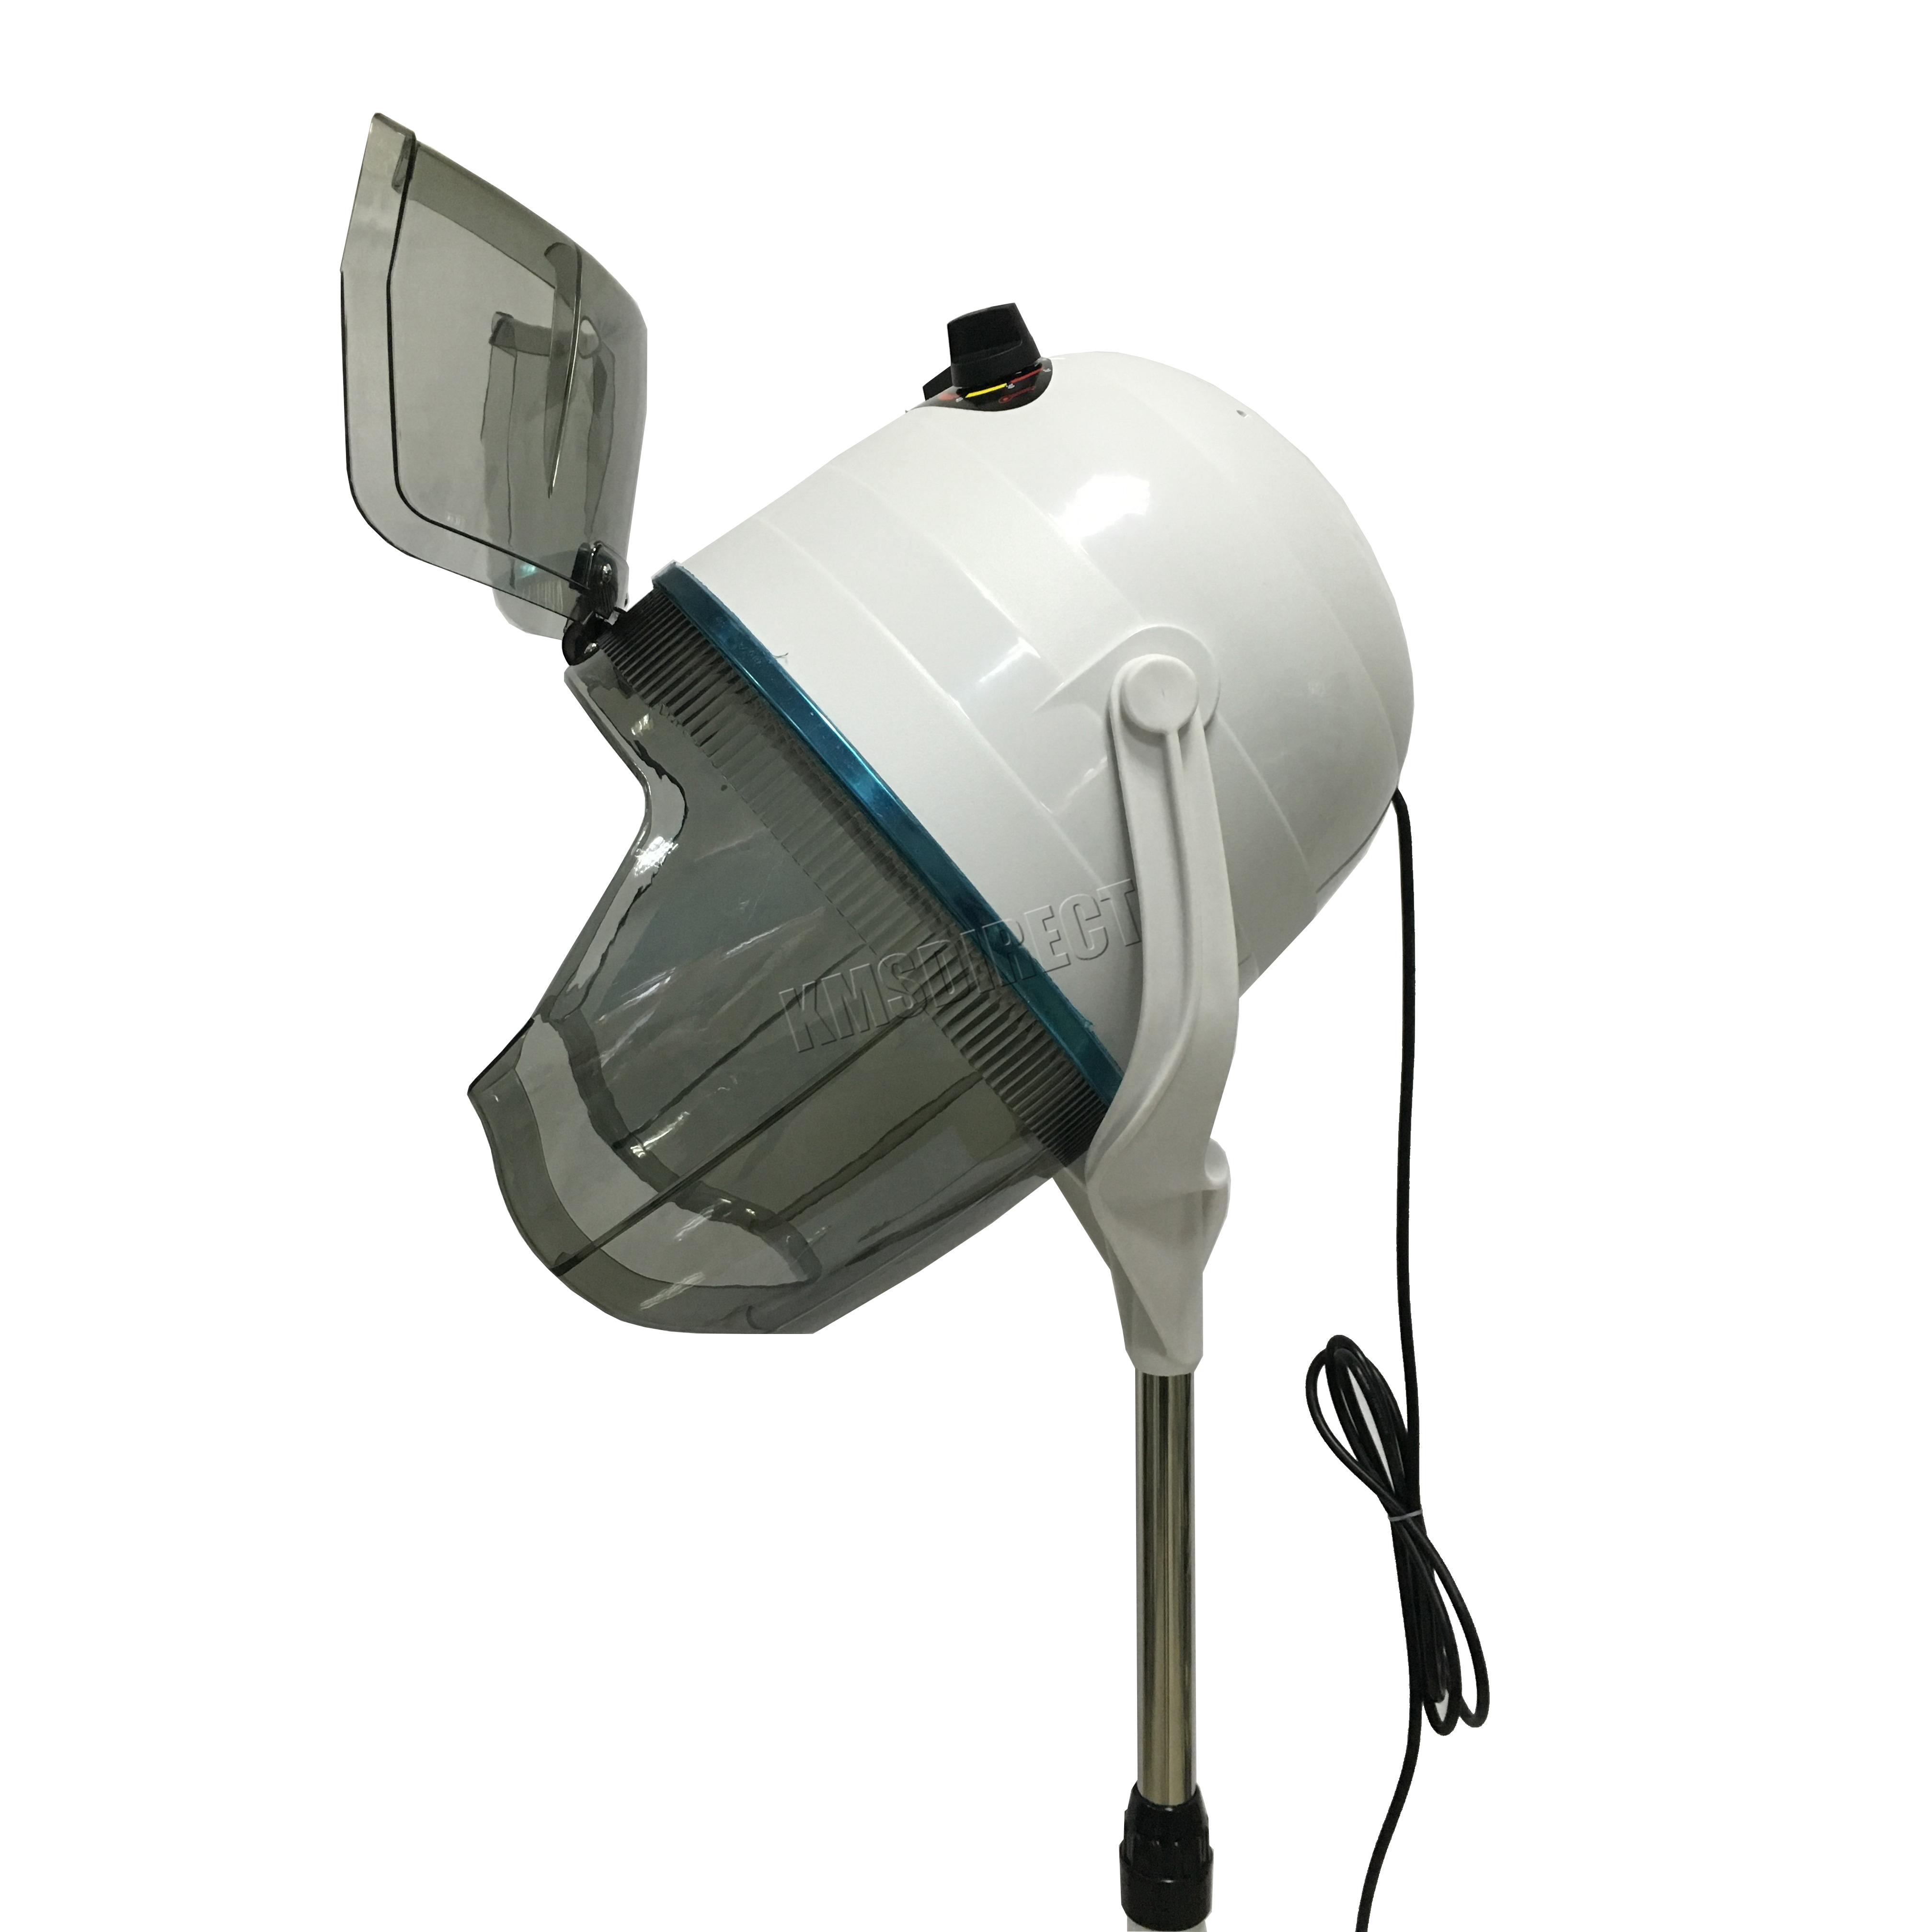 Portable Hair Dryer ~ Foxhunter portable salon hair hood dryer stand up